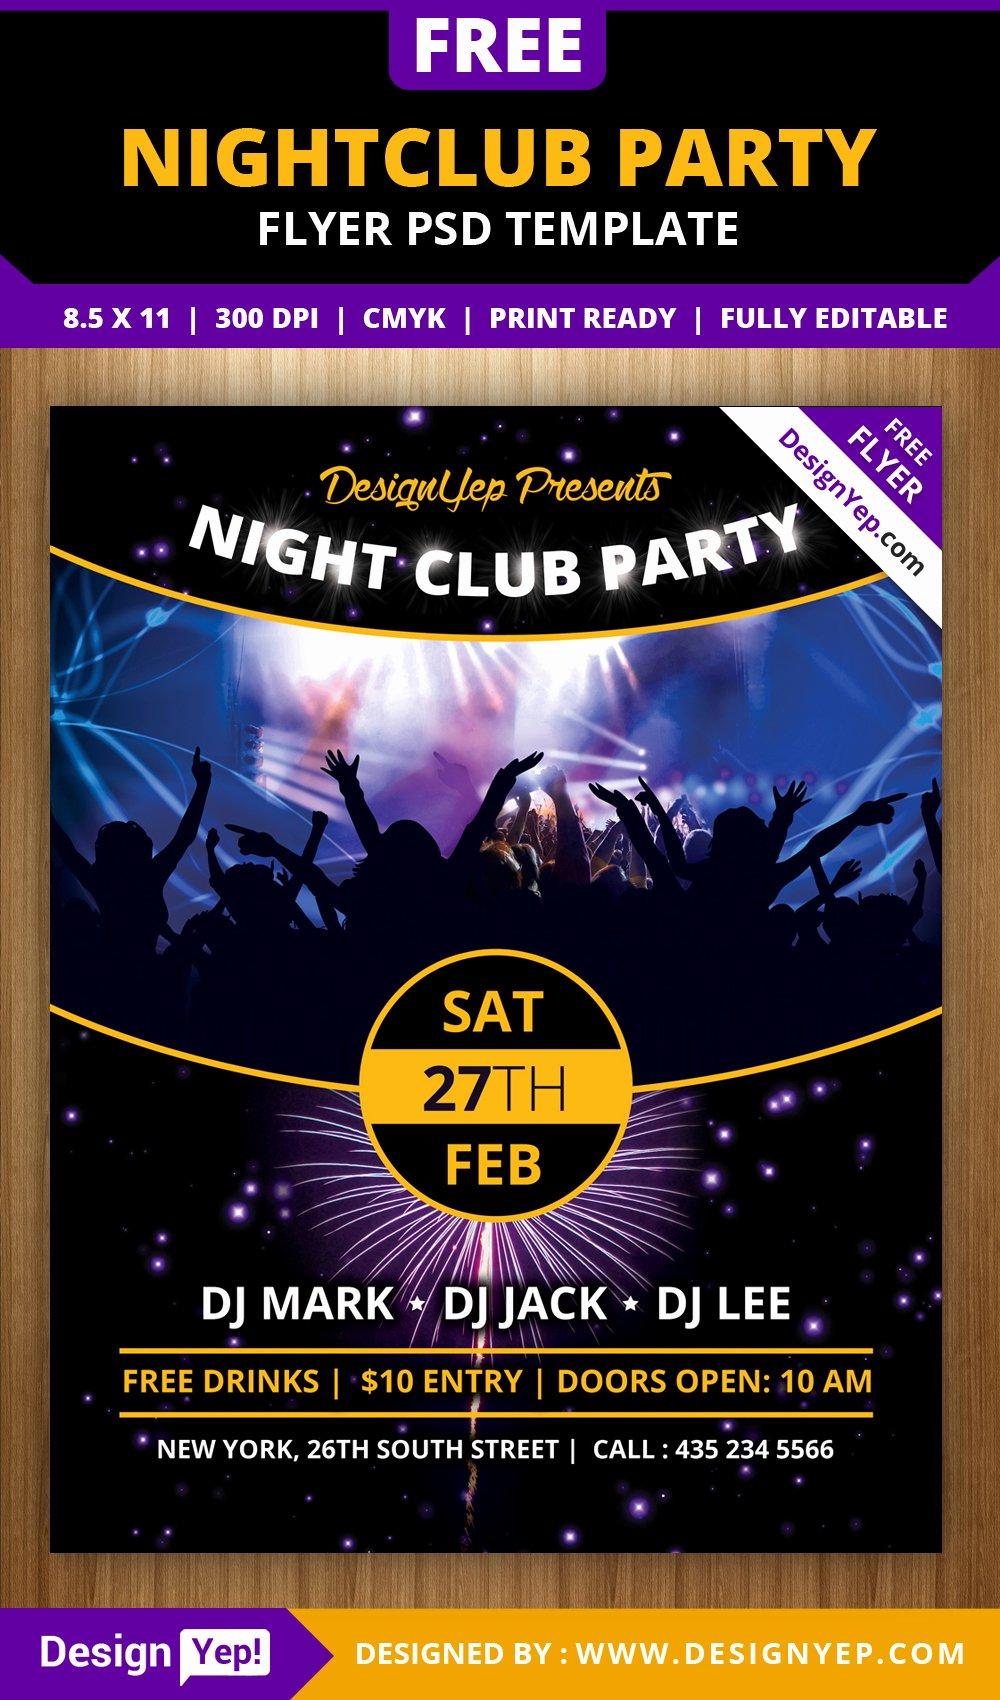 Free Nightclub Party Flyer Psd Template Designyep